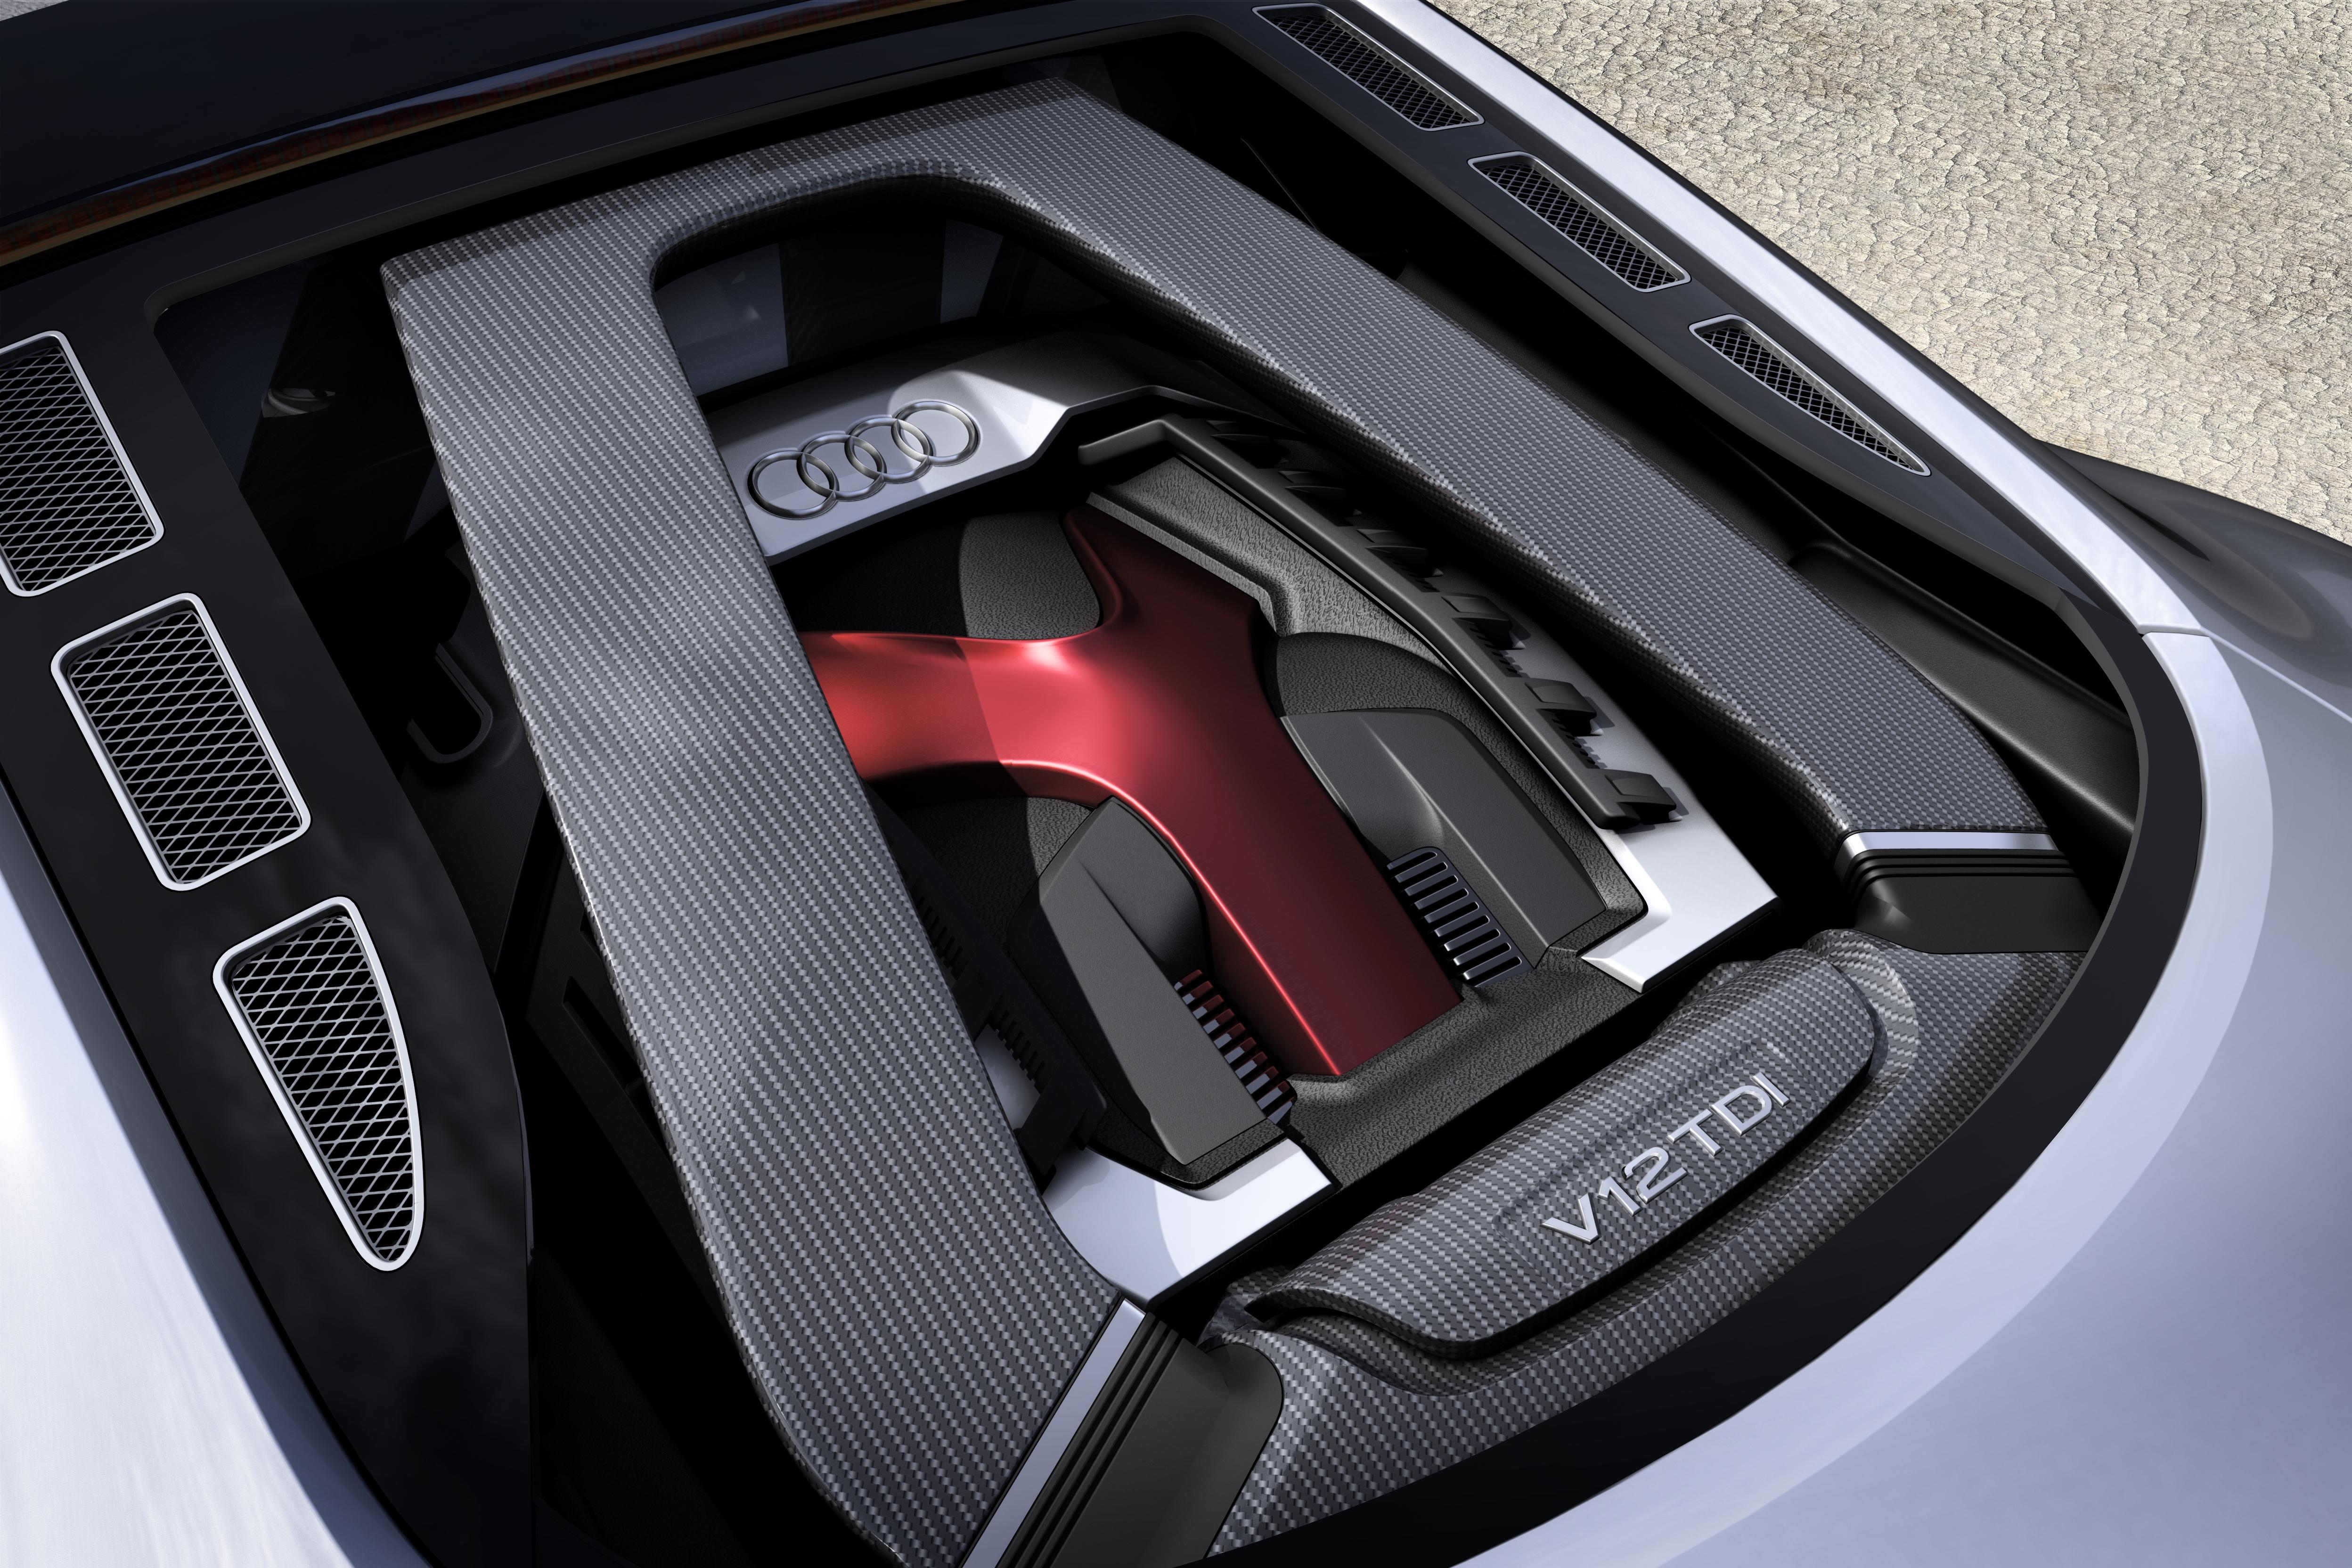 R8 V12 TDI Concept